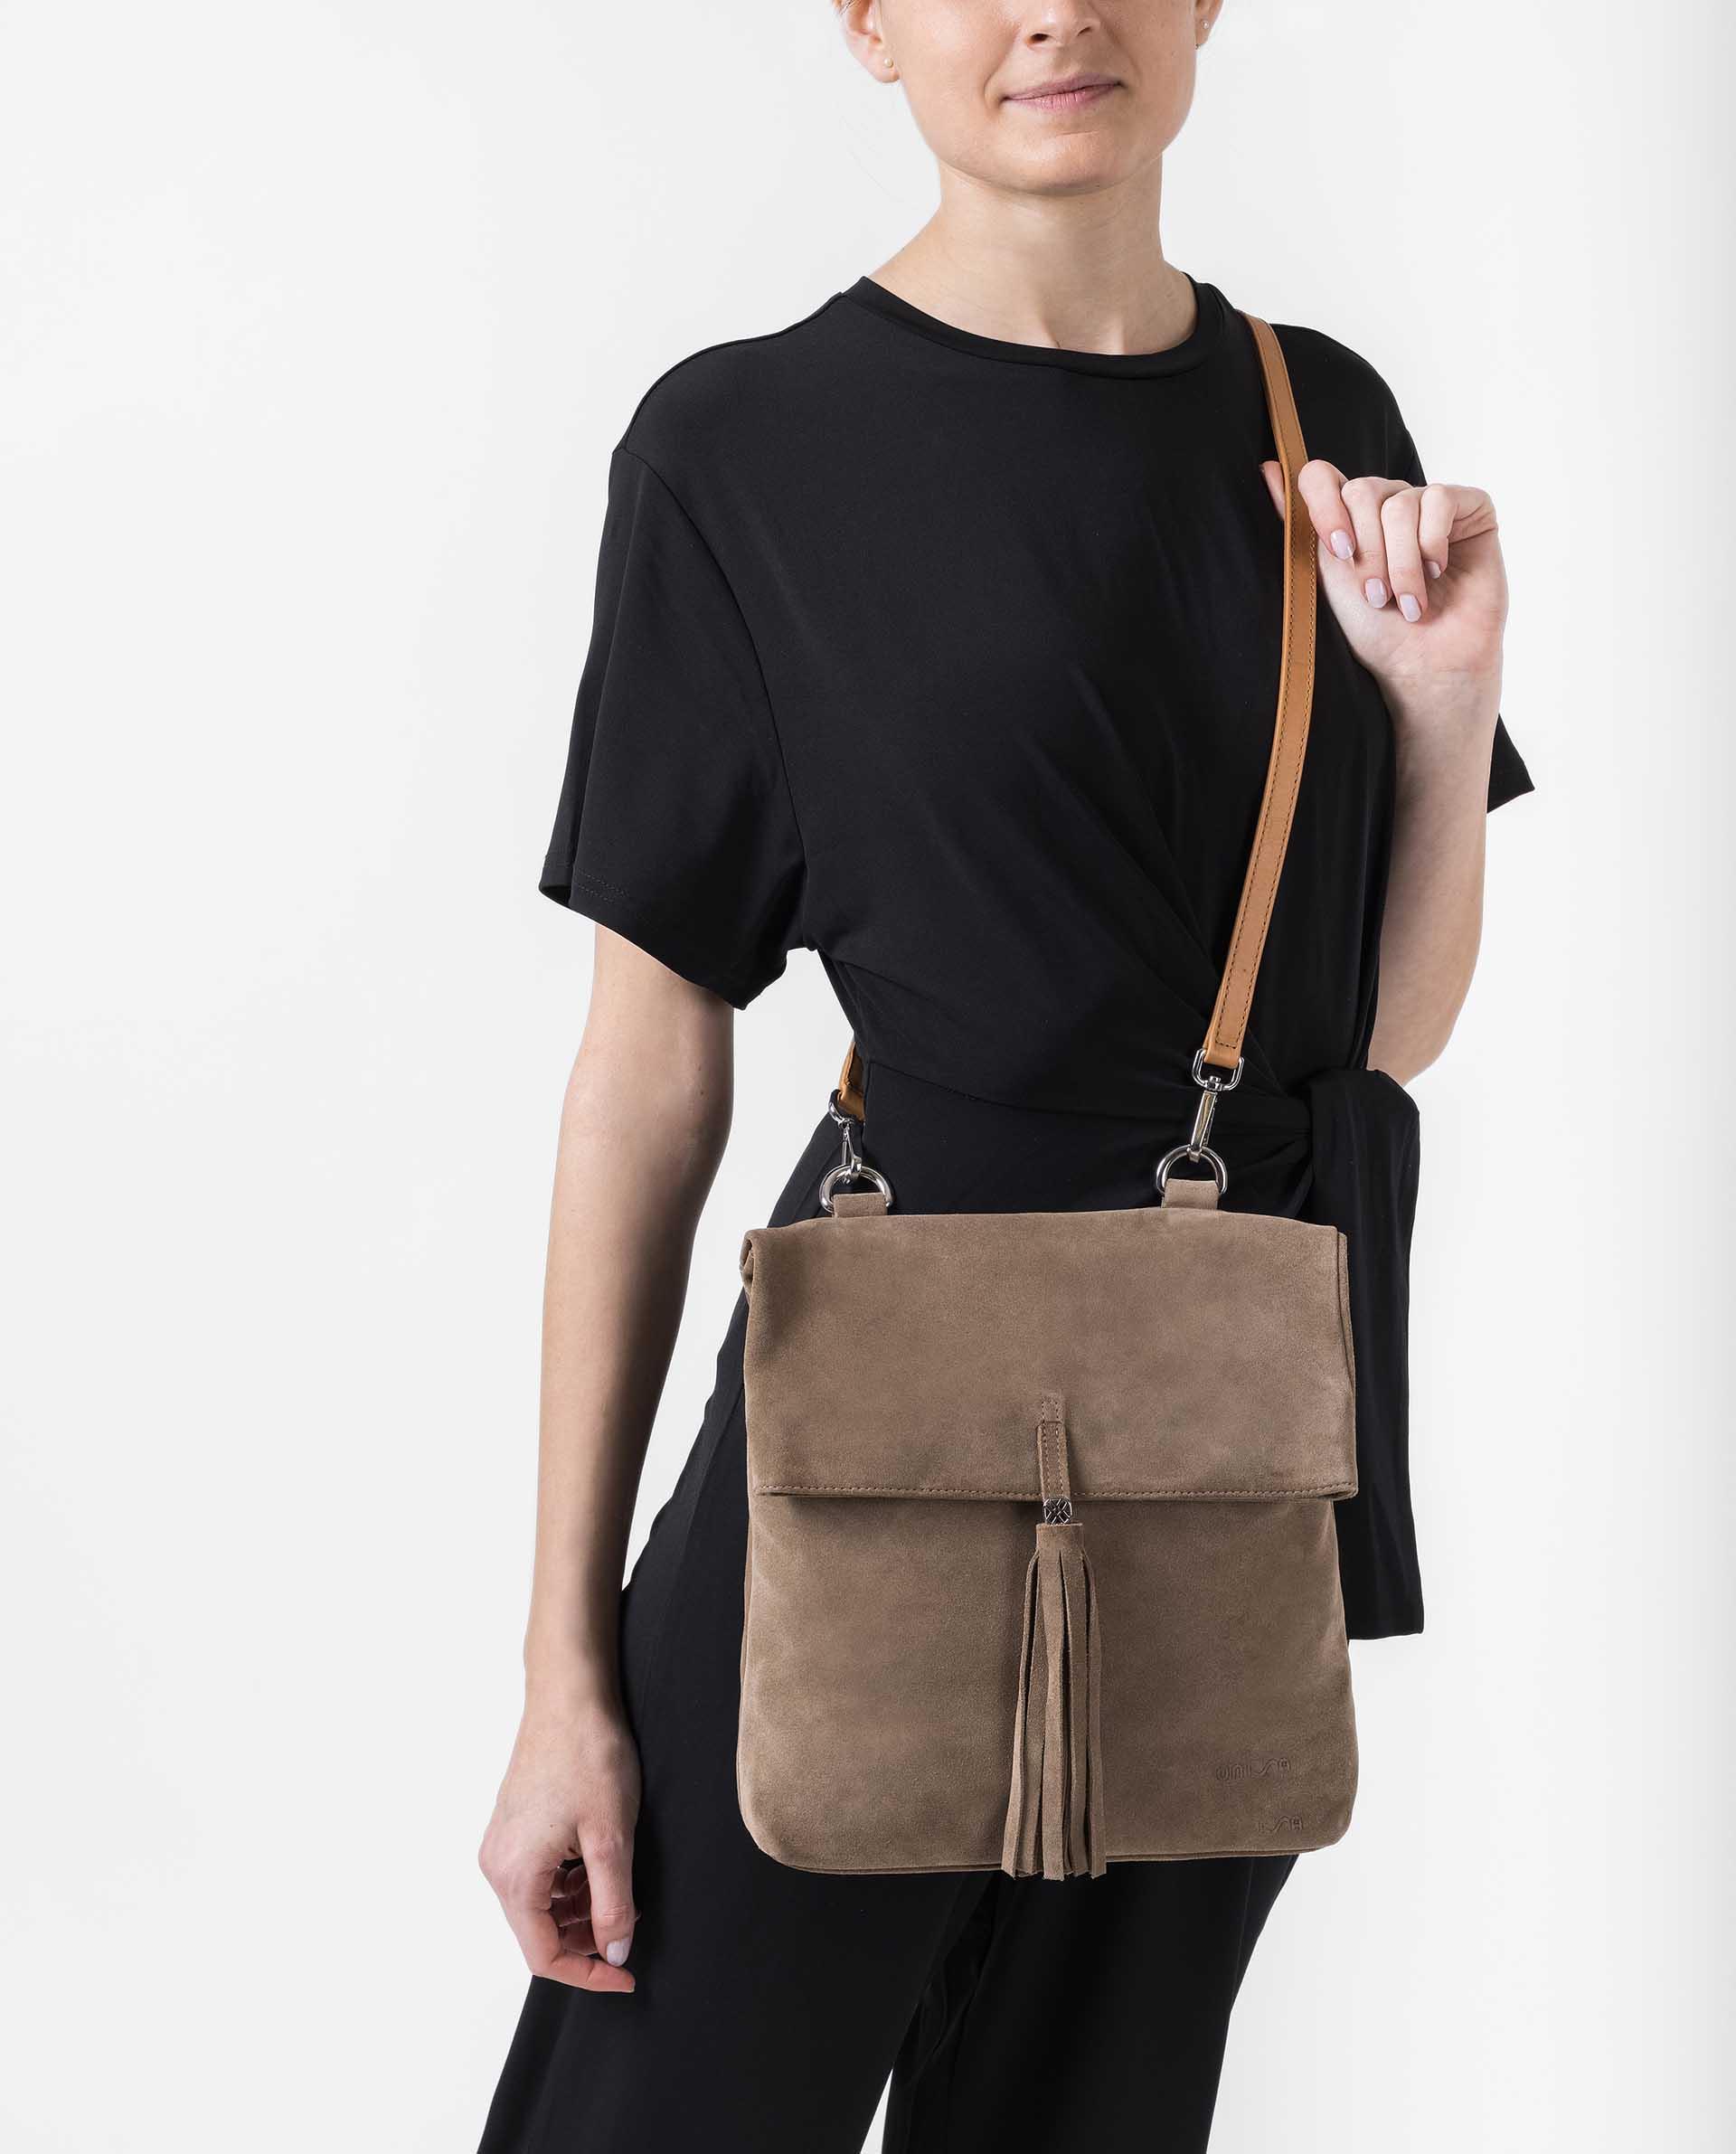 UNISA Handtasche zum Umklappen mit Magnetverschluss ZKALIKA_BS 5